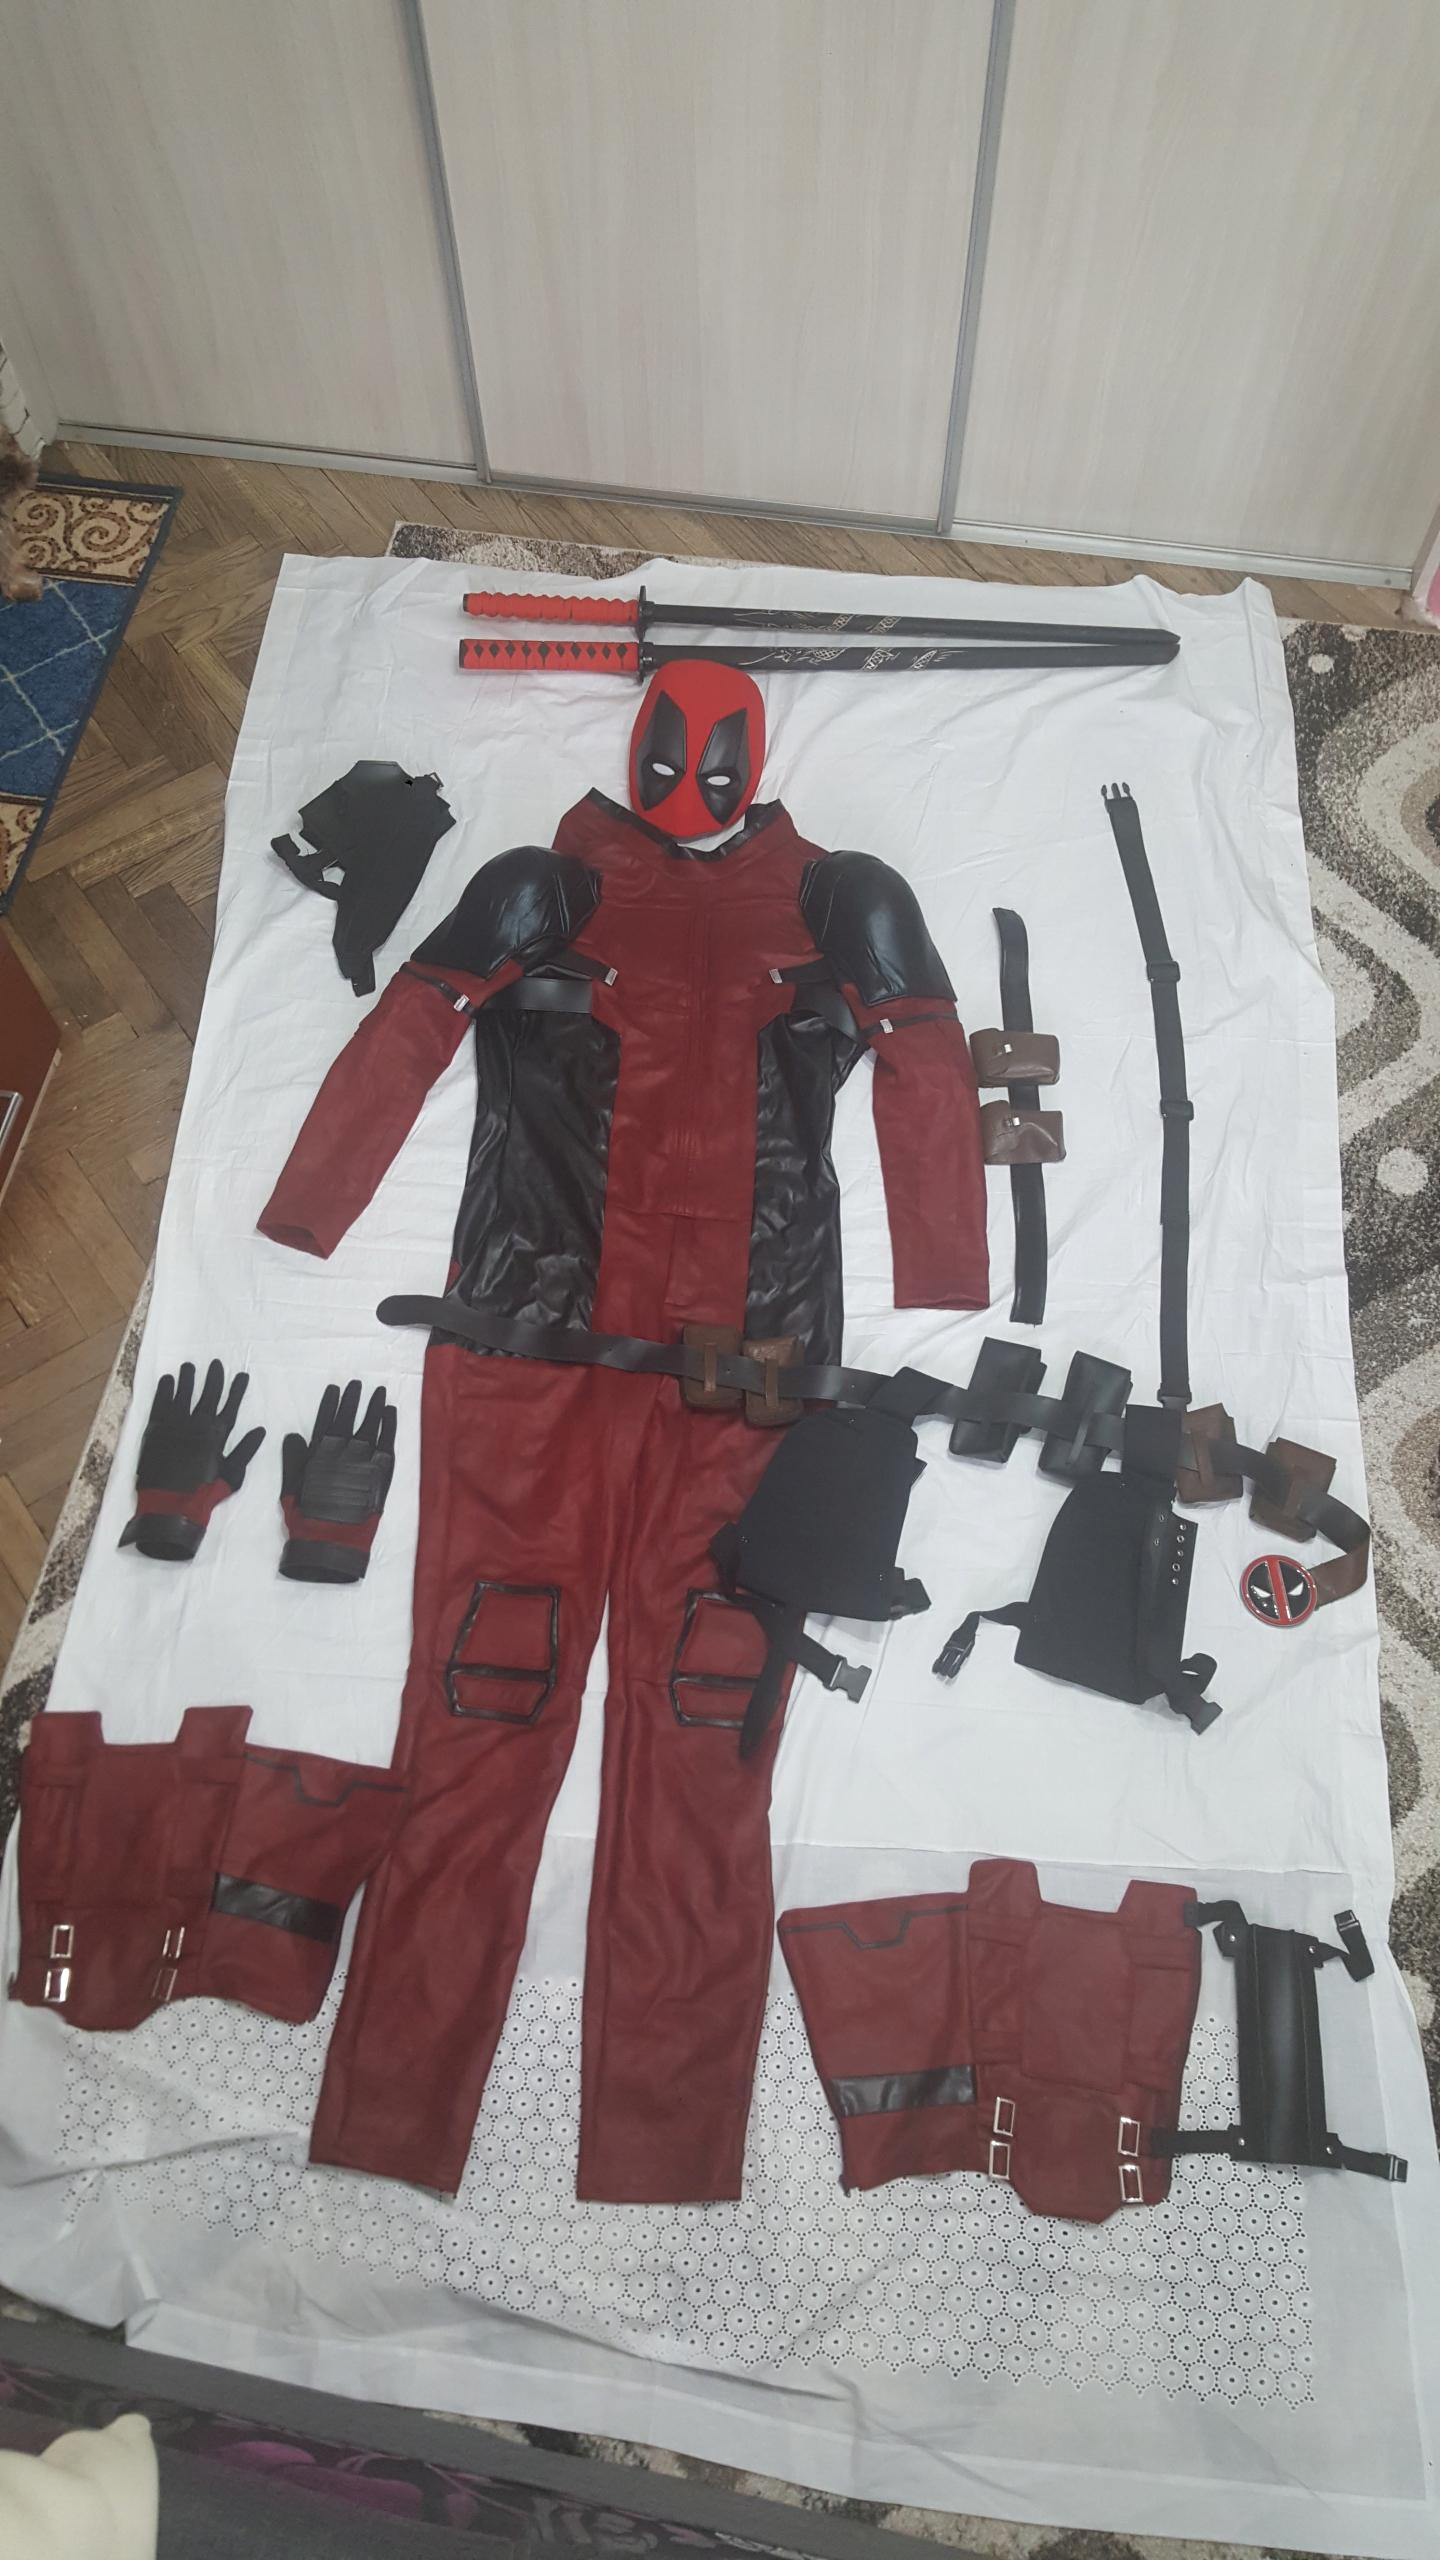 c80387928480af Kostium Deadpool Marvel, maska, miecze - 7937570672 - oficjalne ...